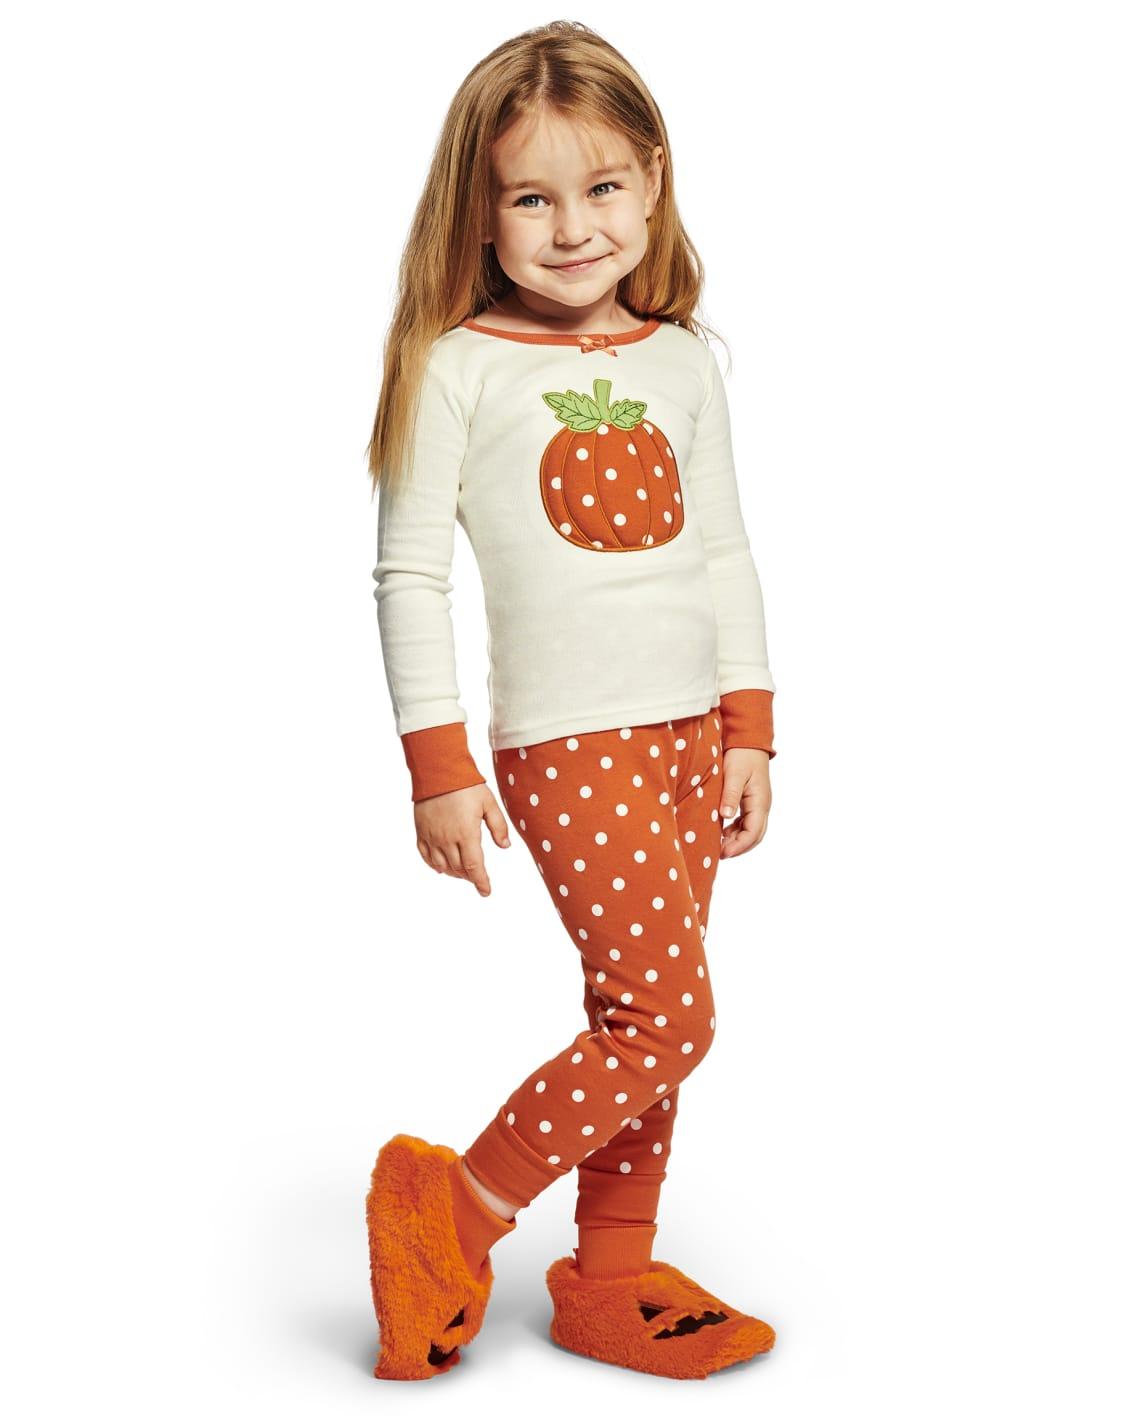 Gymboree: Girls Lil' Pumpkin Cotton 2-Piece Pajamas $9.99